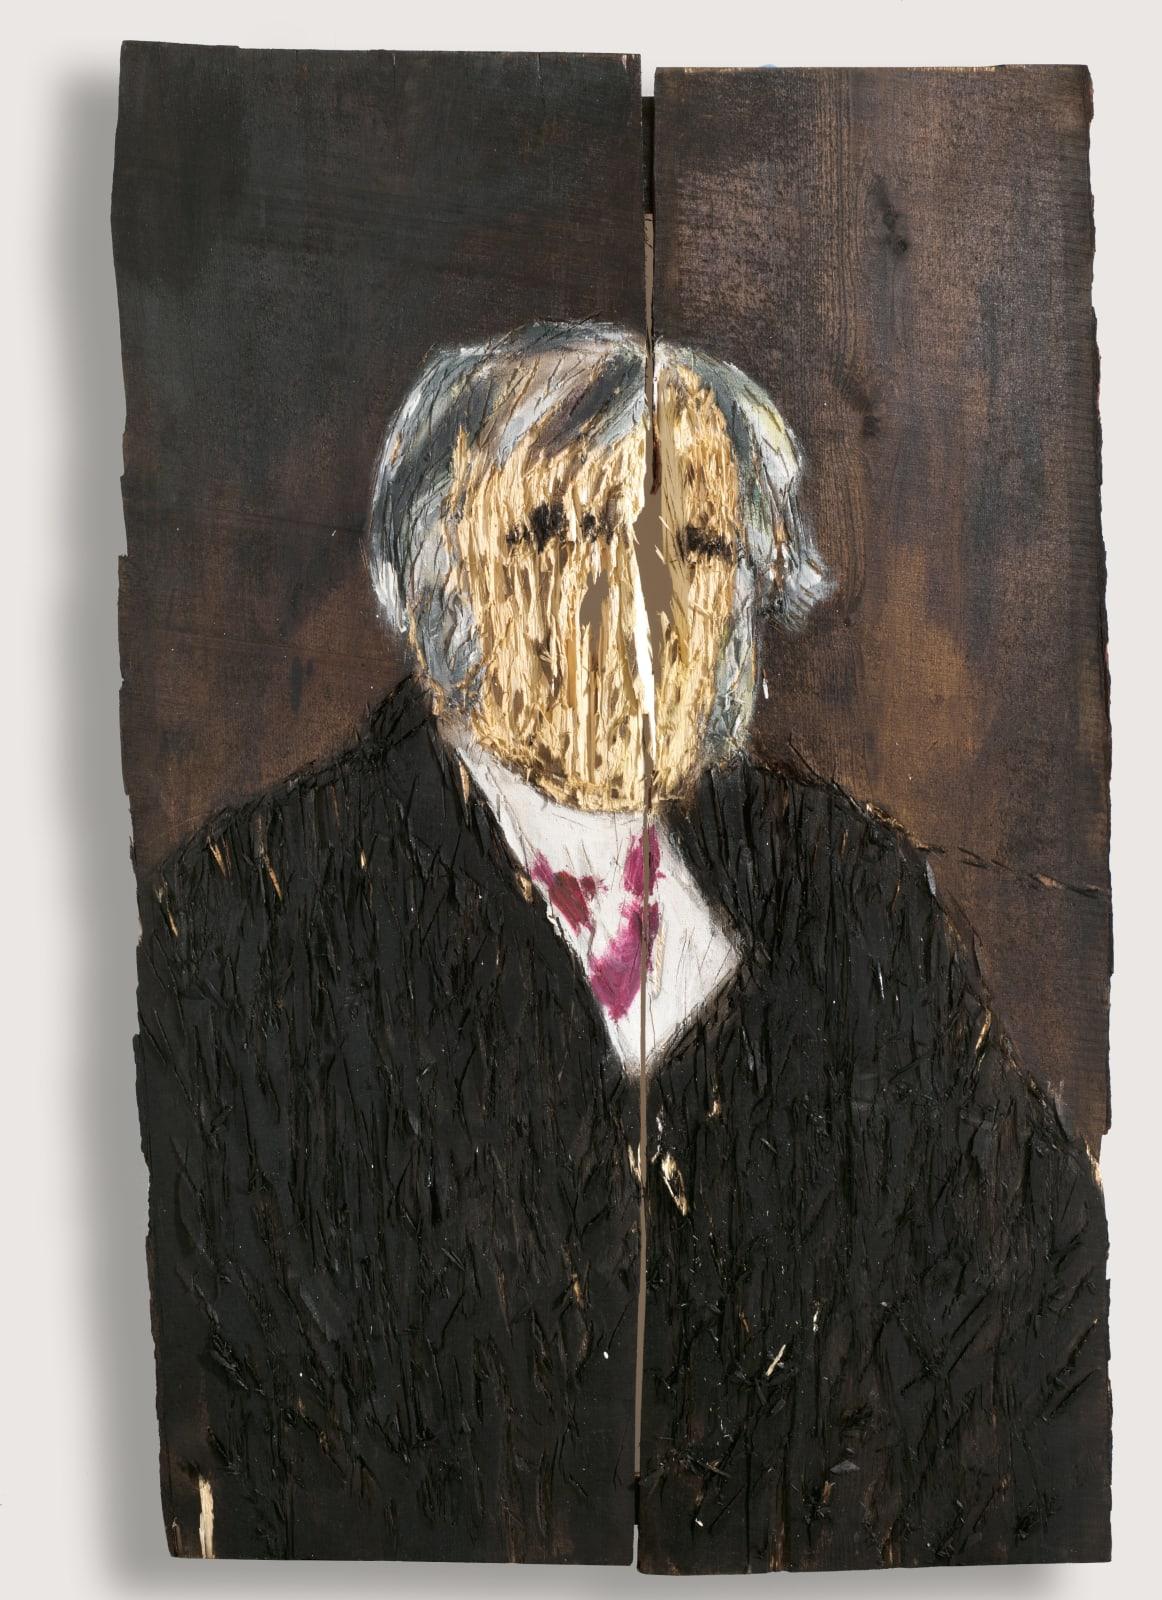 Nestor Engelke Wooden portrait of Ivan Krylov from the series